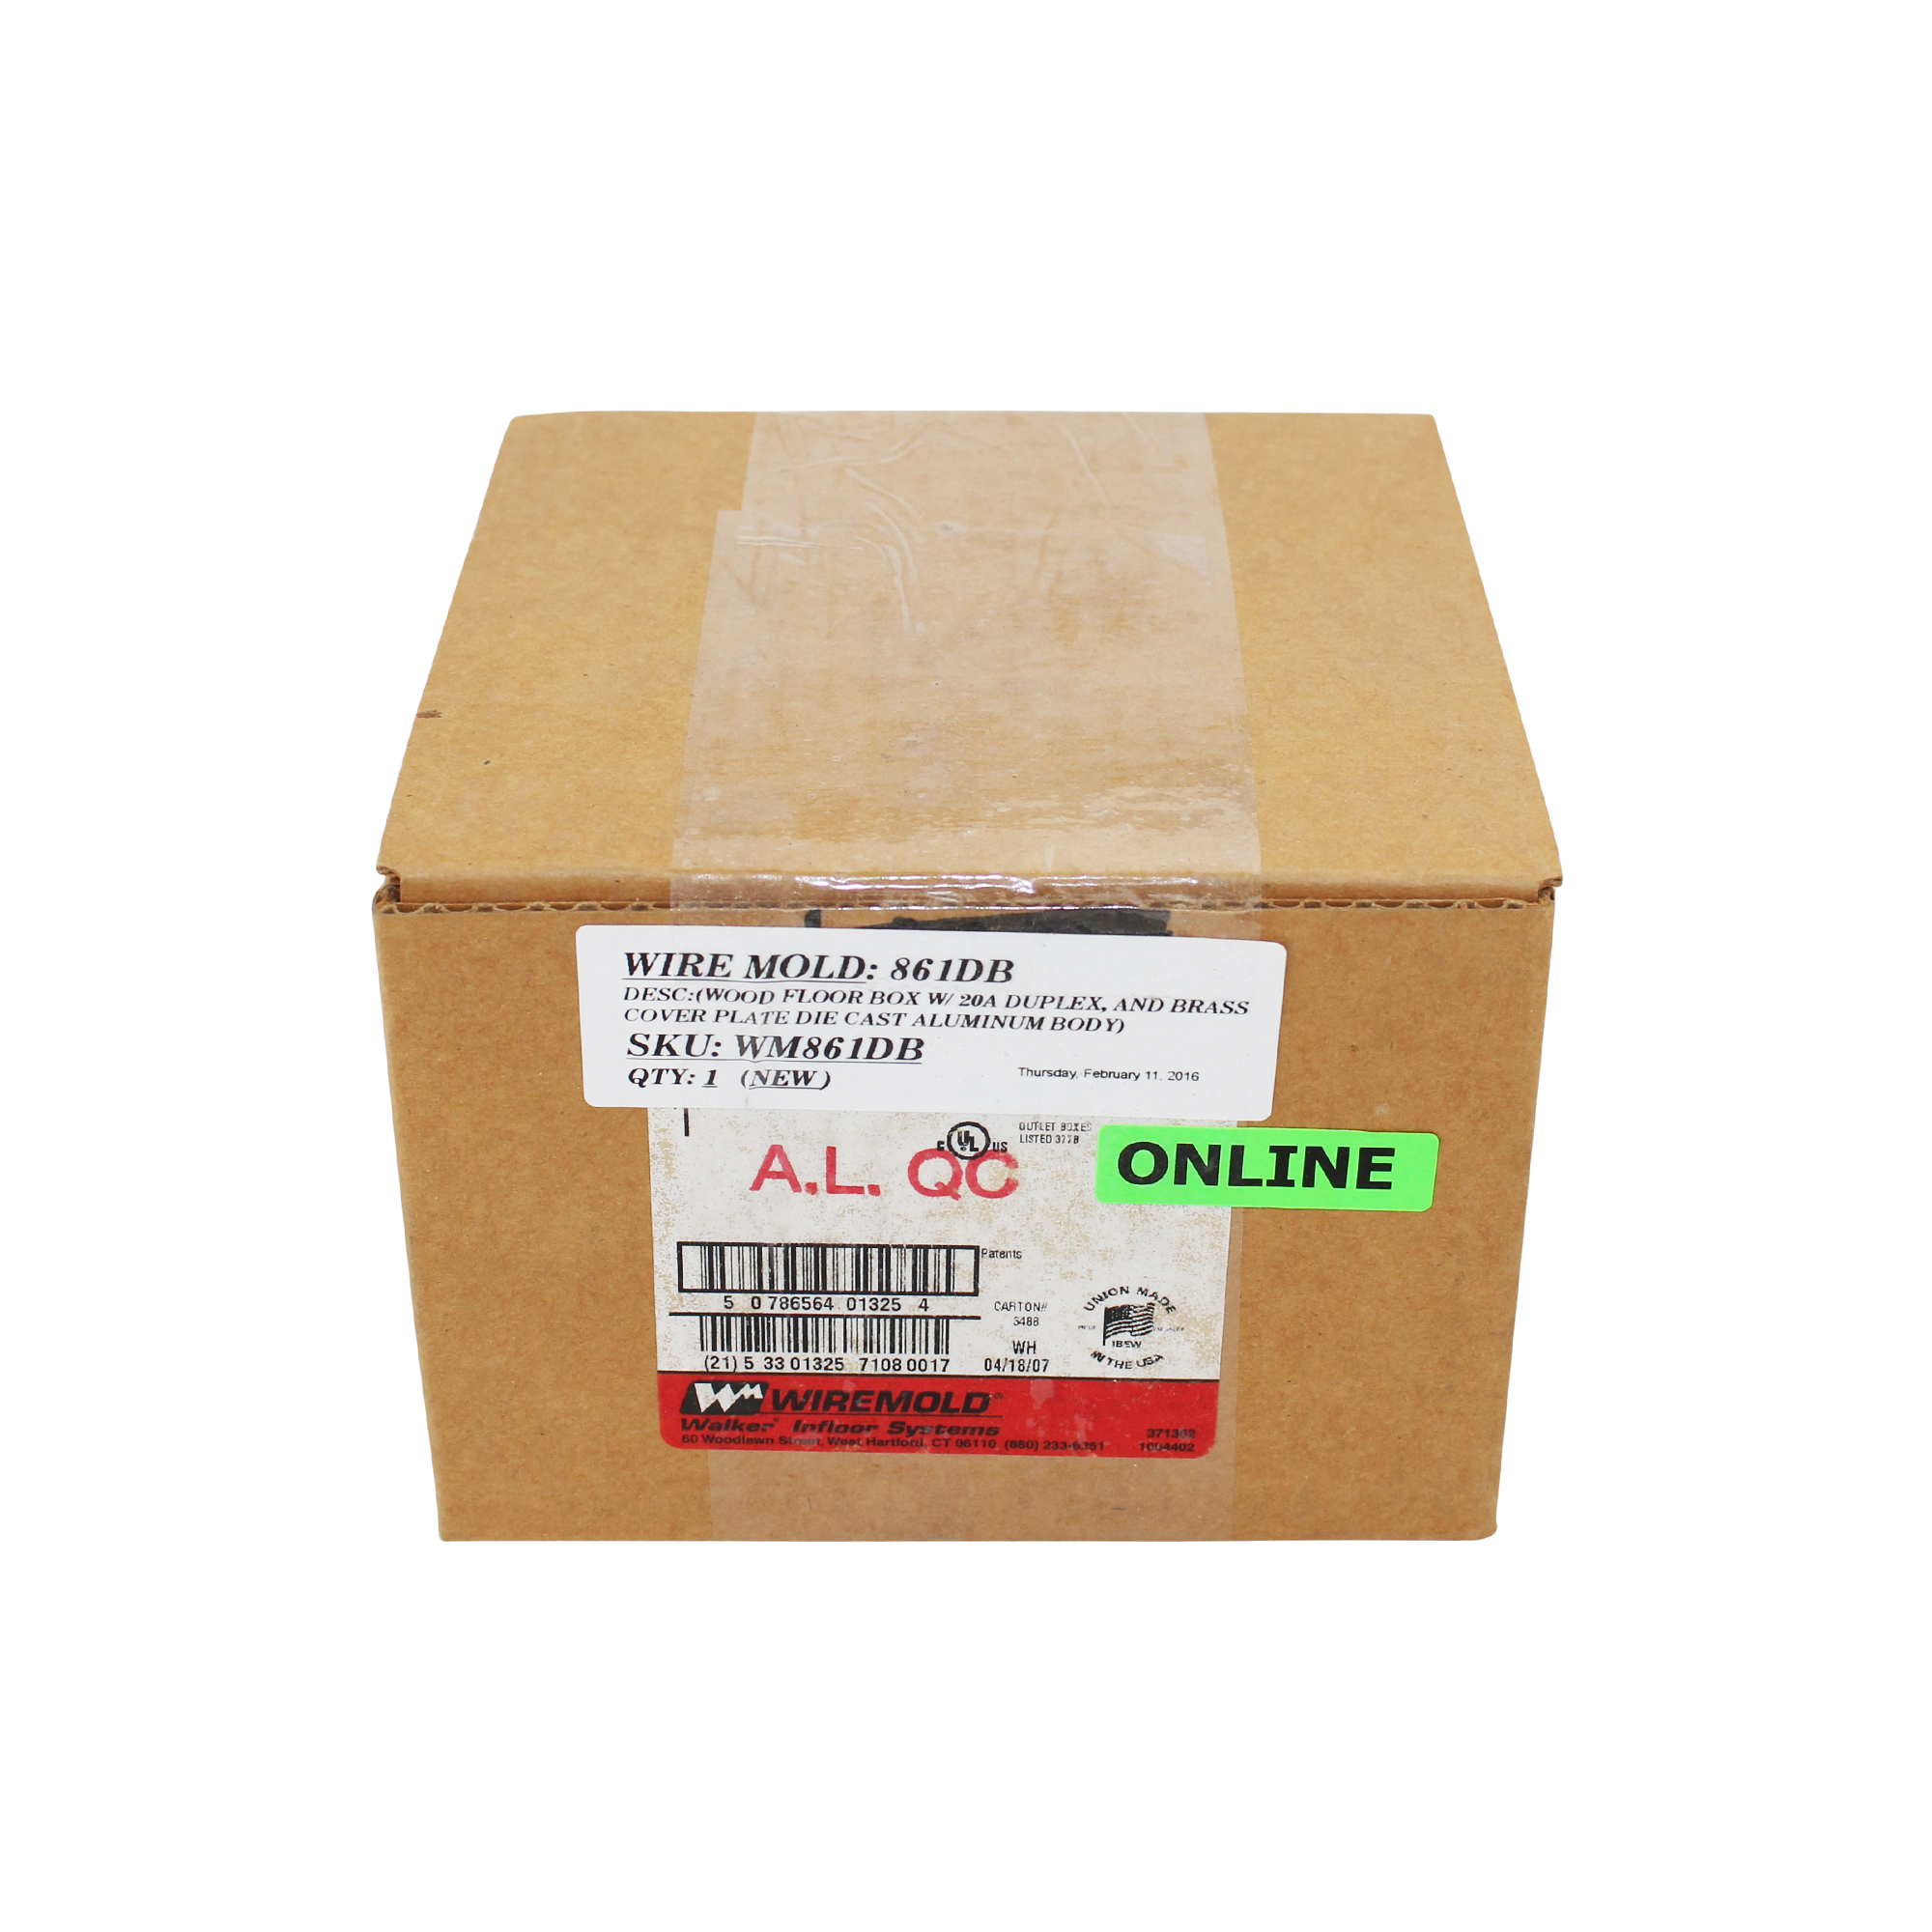 50 x BB105B Silizium-Epitaxial-Planar-Kapazitäts-Variationsdioden TFK  50pcs